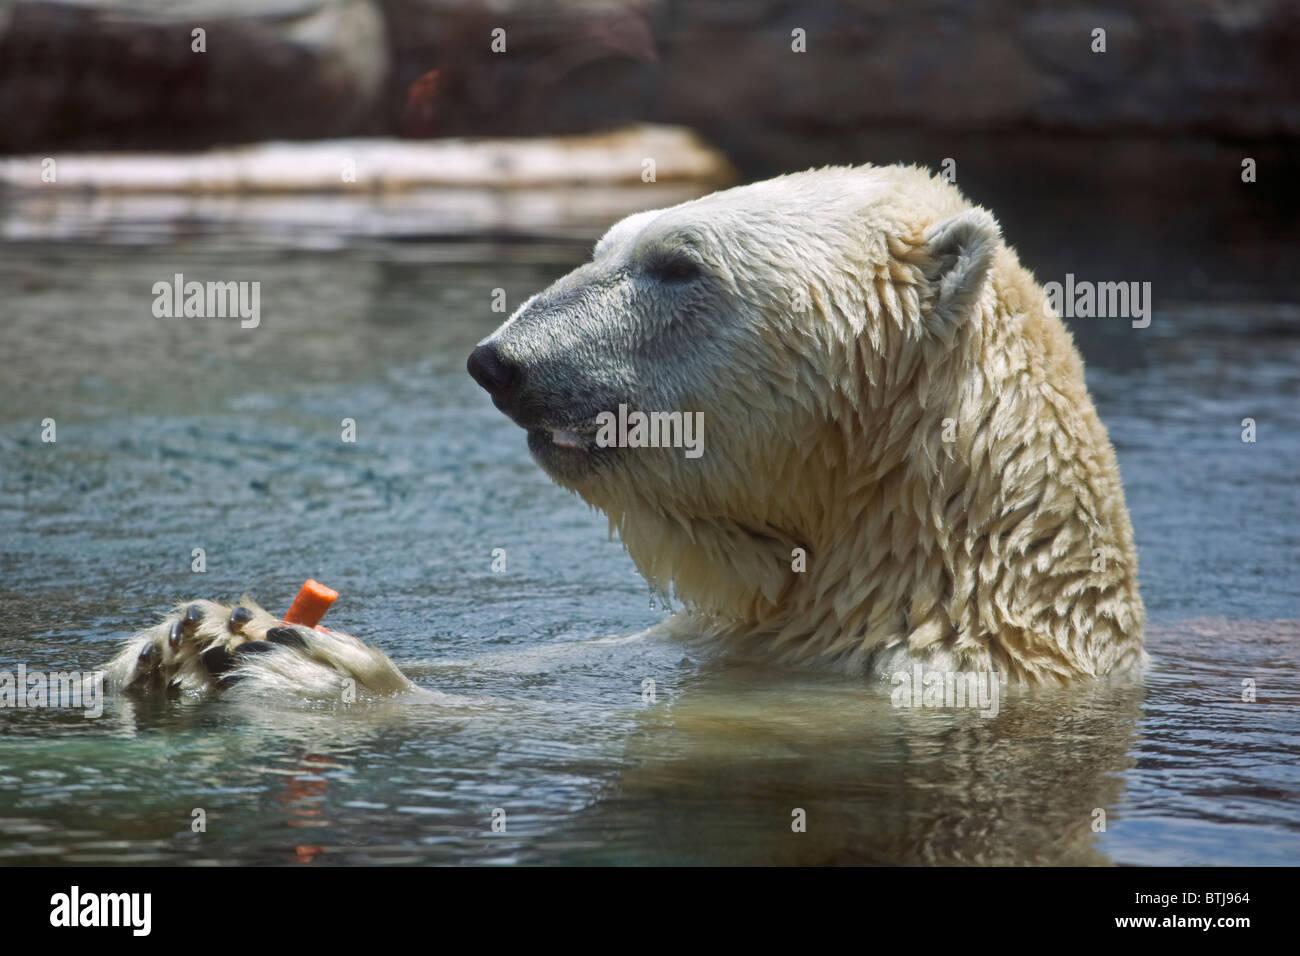 A POLAR BEAR (Ursus maritimus) in a pool at the SAN DIEGO ZOO - CALIFORNIA - Stock Image